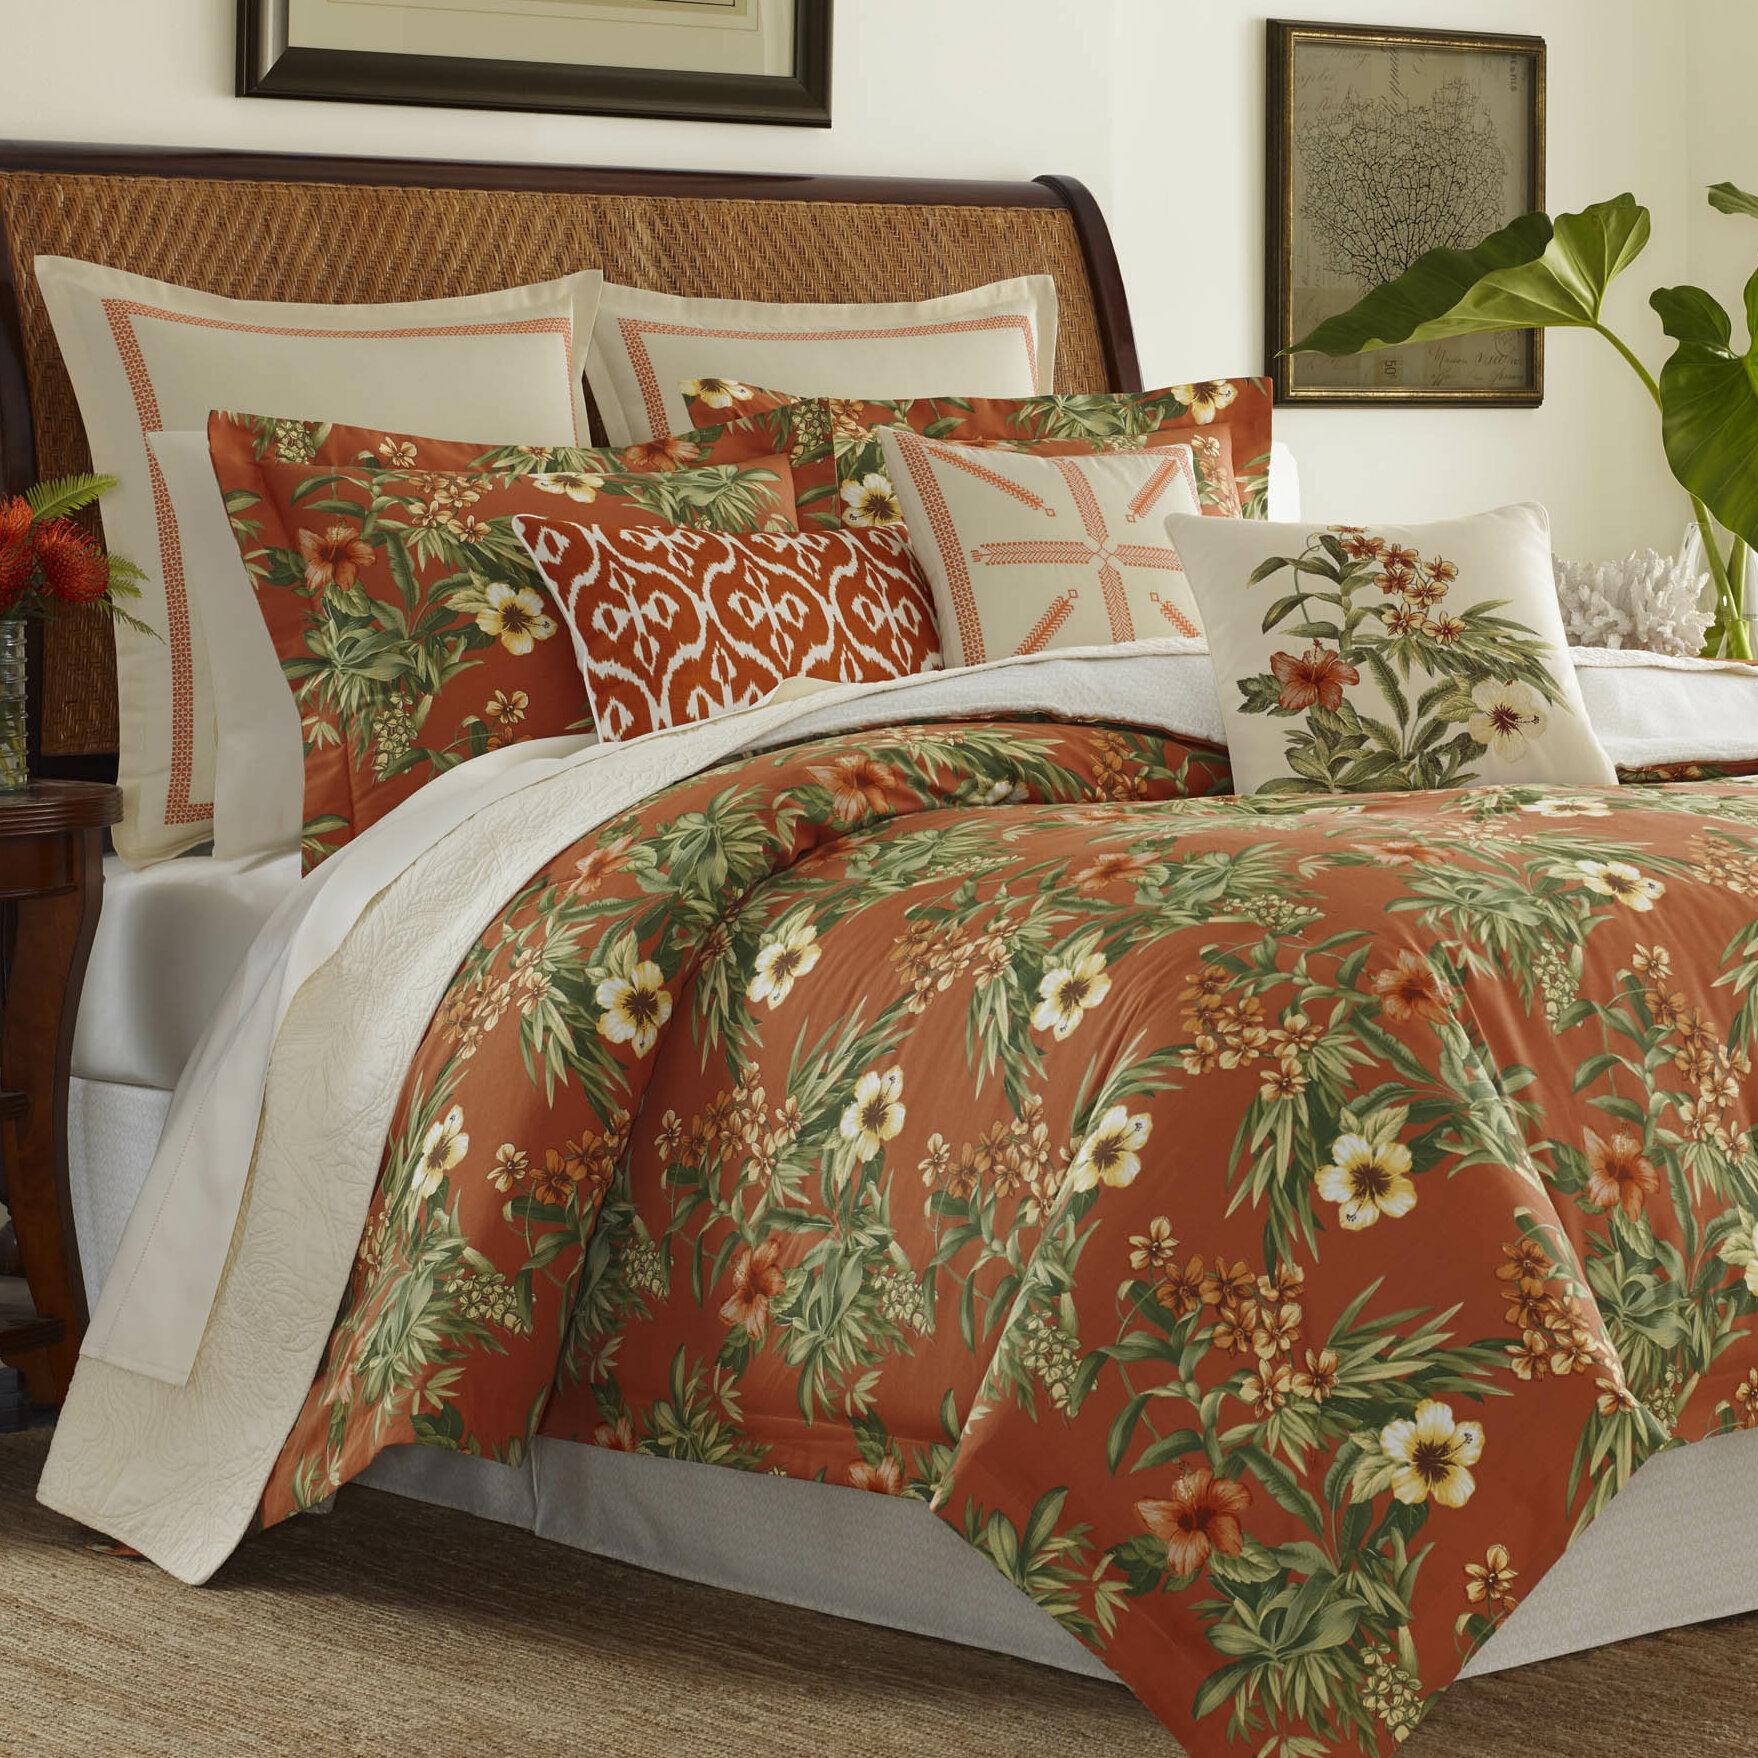 Tommy Bahama Home Rio De Janeiro Comforter Set By Tommy Bahama Bedding |  Wayfair